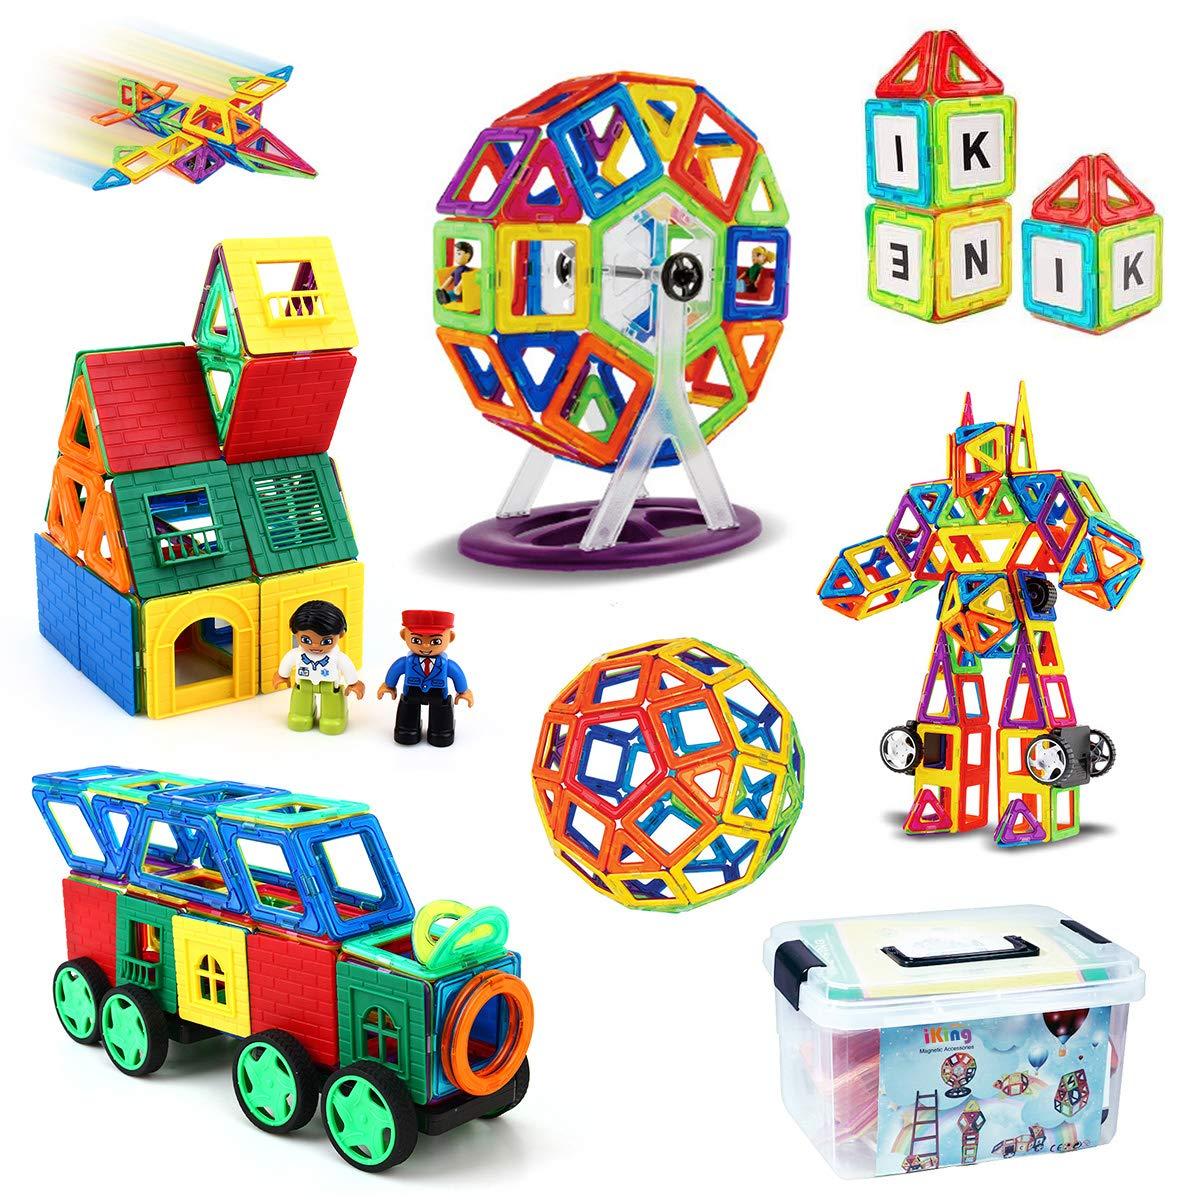 iKing マグネットブロック 162ピース 磁気おもちゃ 大容量 誕生日プレゼント 子供 マグネットおもちゃ 磁石ブロック 知育玩具 立体パズル モデル ゲーム DIY 積み木 ブロック おもちゃ 子ども オモチャ 車・かんらんしゃ・ロボット・三角形・四角形・数字・英語など 磁性構築 立体パズル 幼児 知育オモチ キッズ 女の子 男の子 玩具 入園 ギフト プレゼント 贈り物 日本語 収納便利 ケース付き ママ安心【特許実施許諾承認取得】